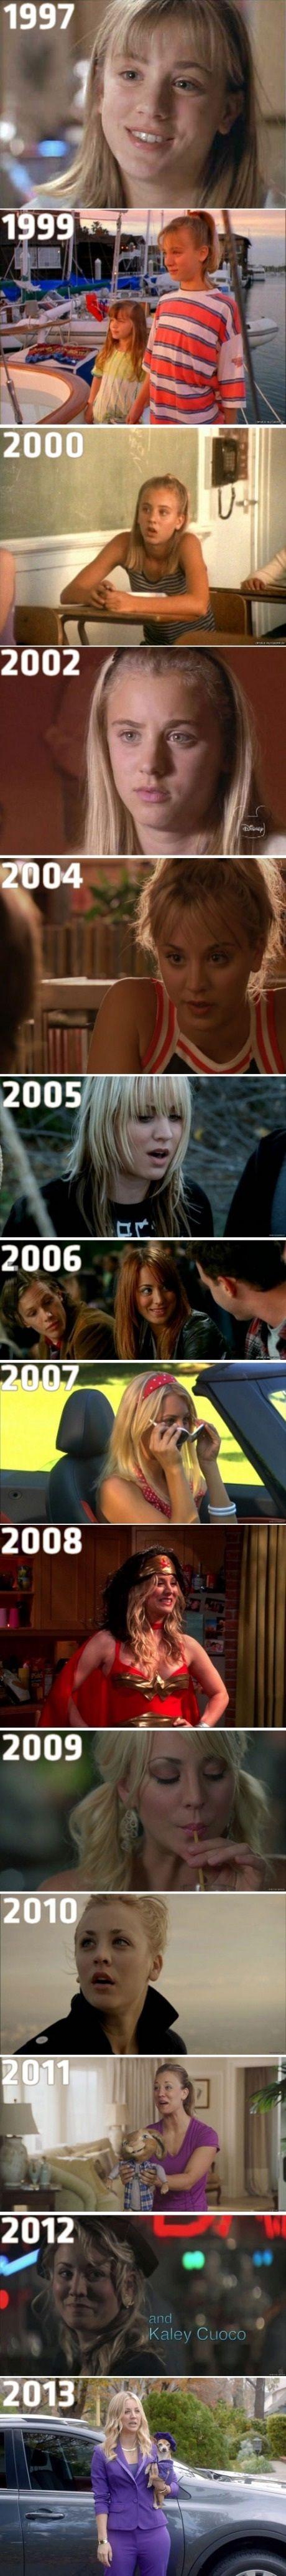 Kaley Cuoco Evolution..